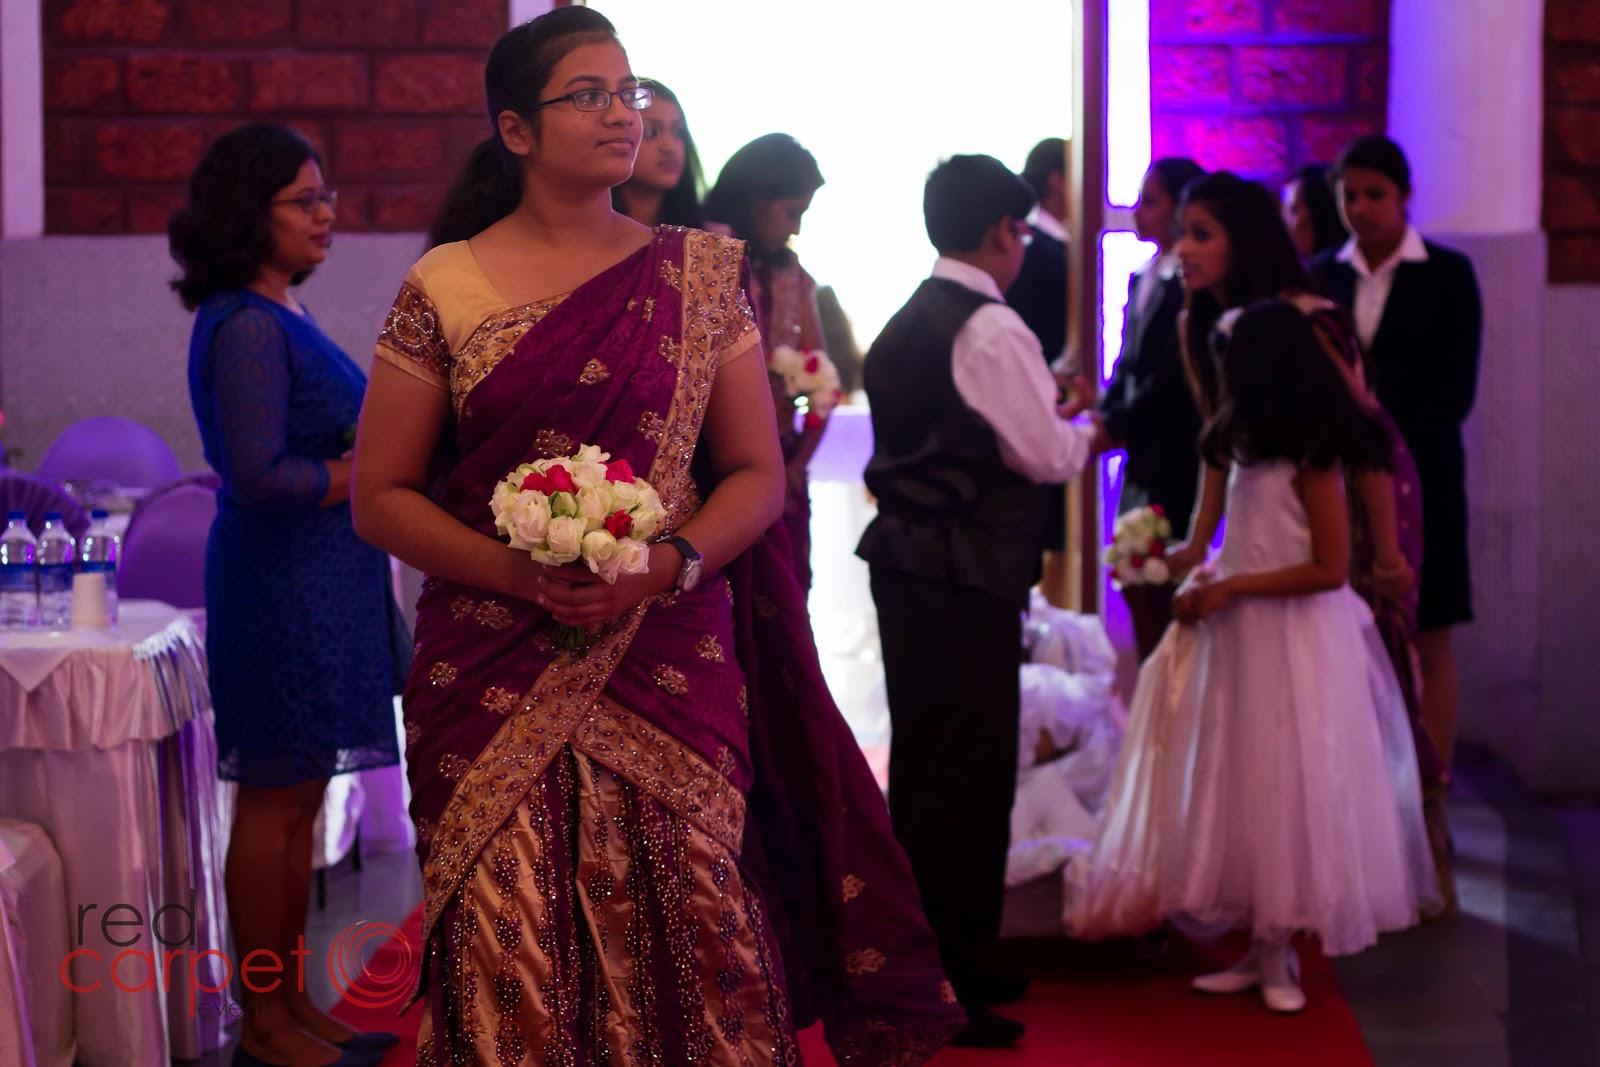 Hindu Yadava Brides and Grooms,Matrimonial,Matrimony